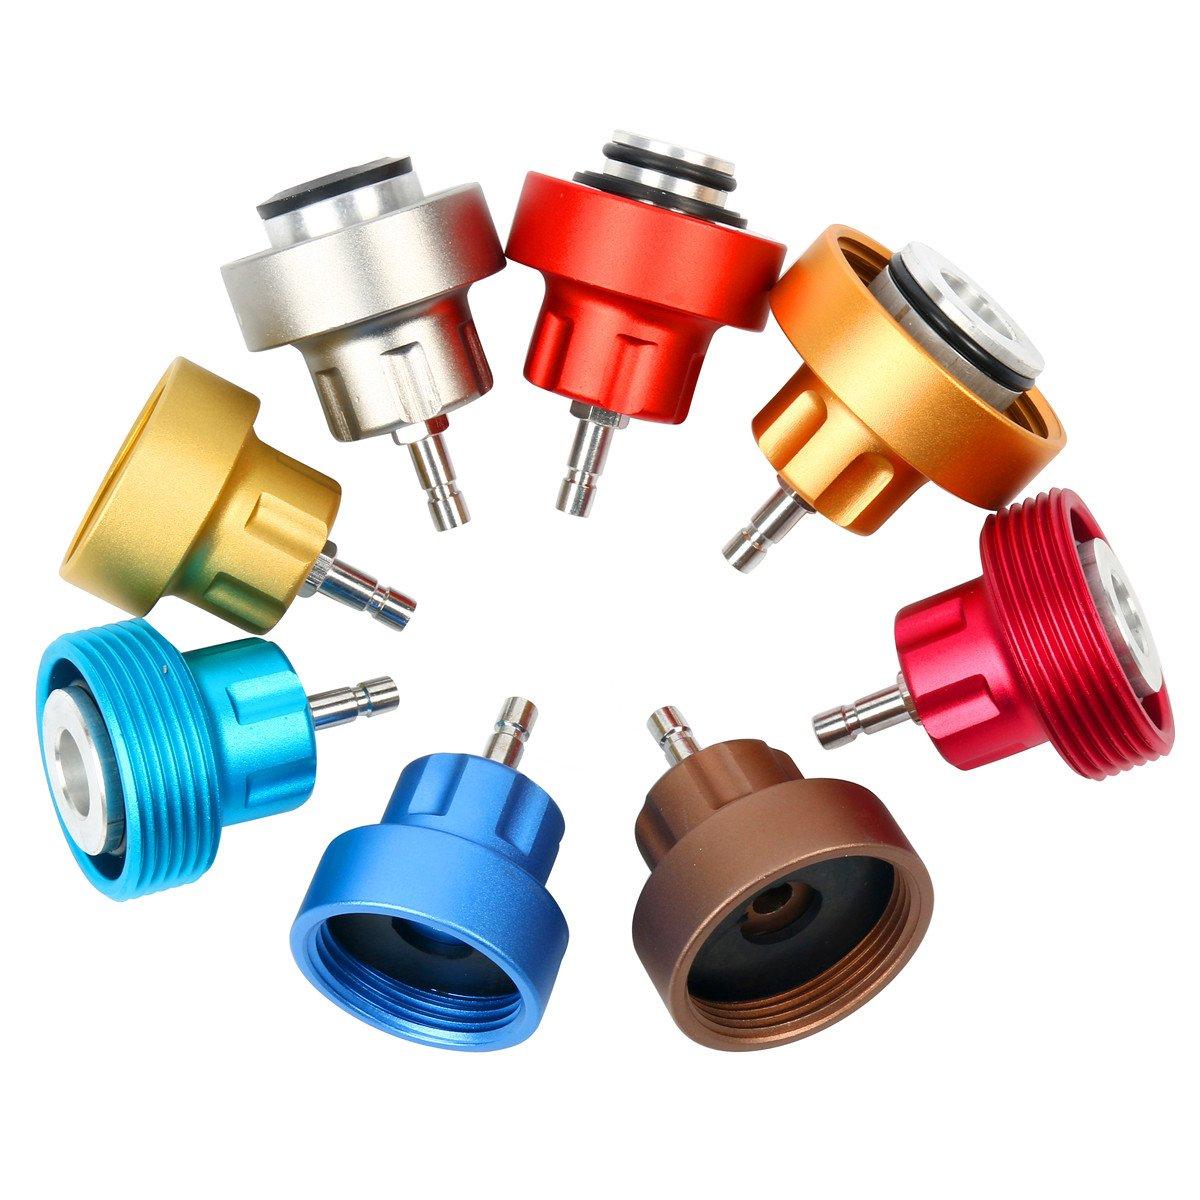 8MILELAKE 14pc Radiator Pump Pressure Leak Tester Kit Vacuum Pressure Cooling System Tester by 8MILELAKE (Image #2)